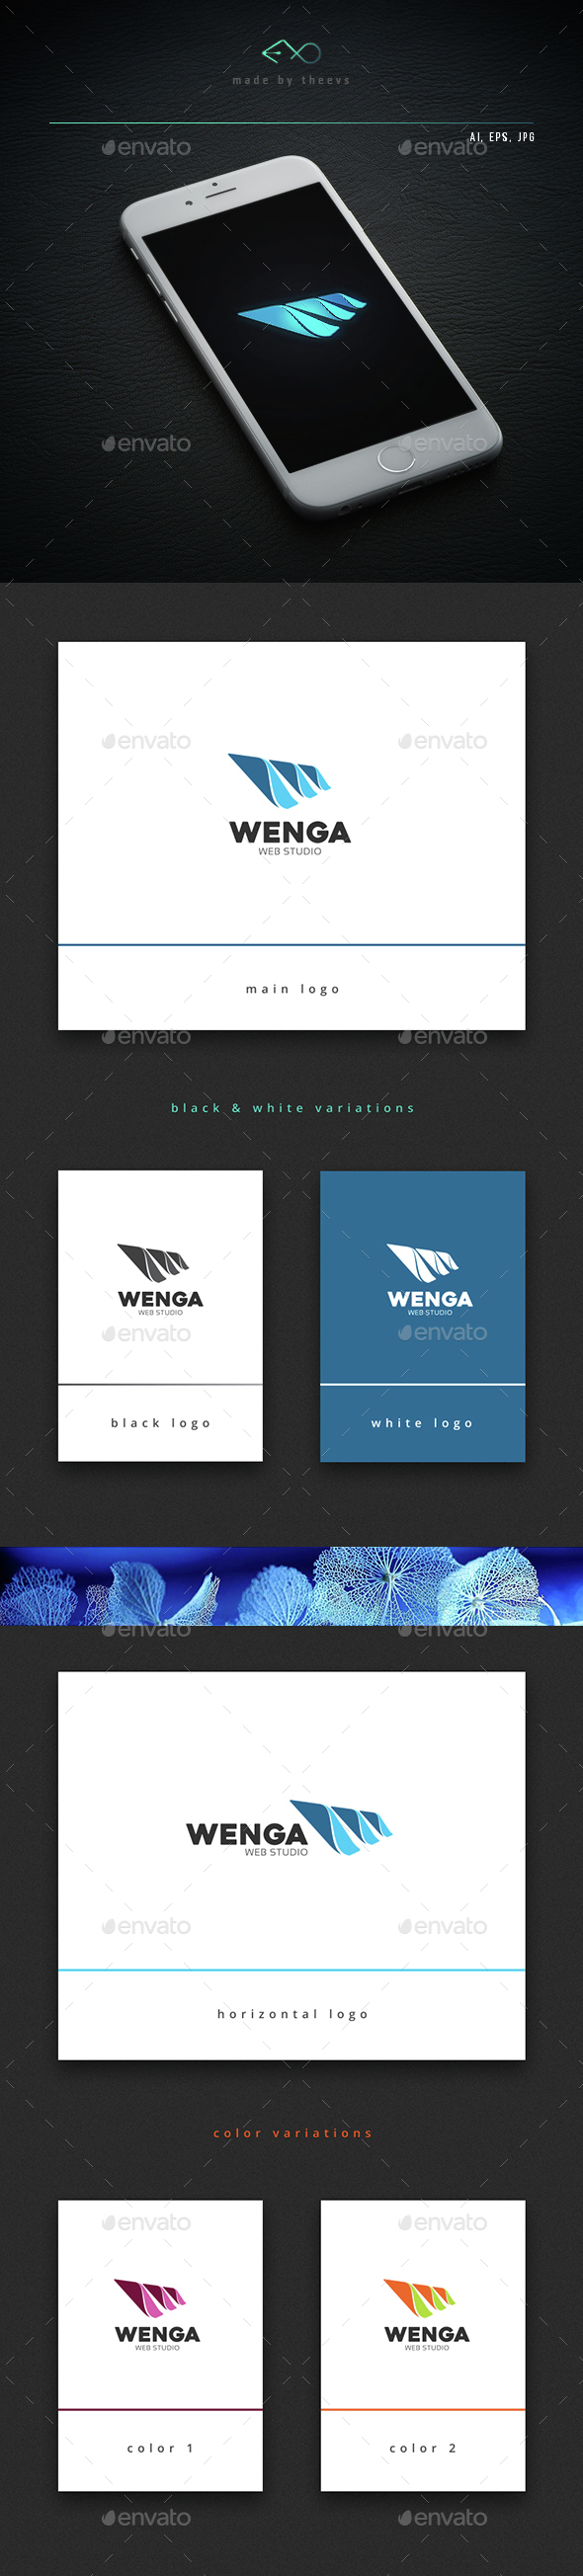 Wenga - Vector Abstract